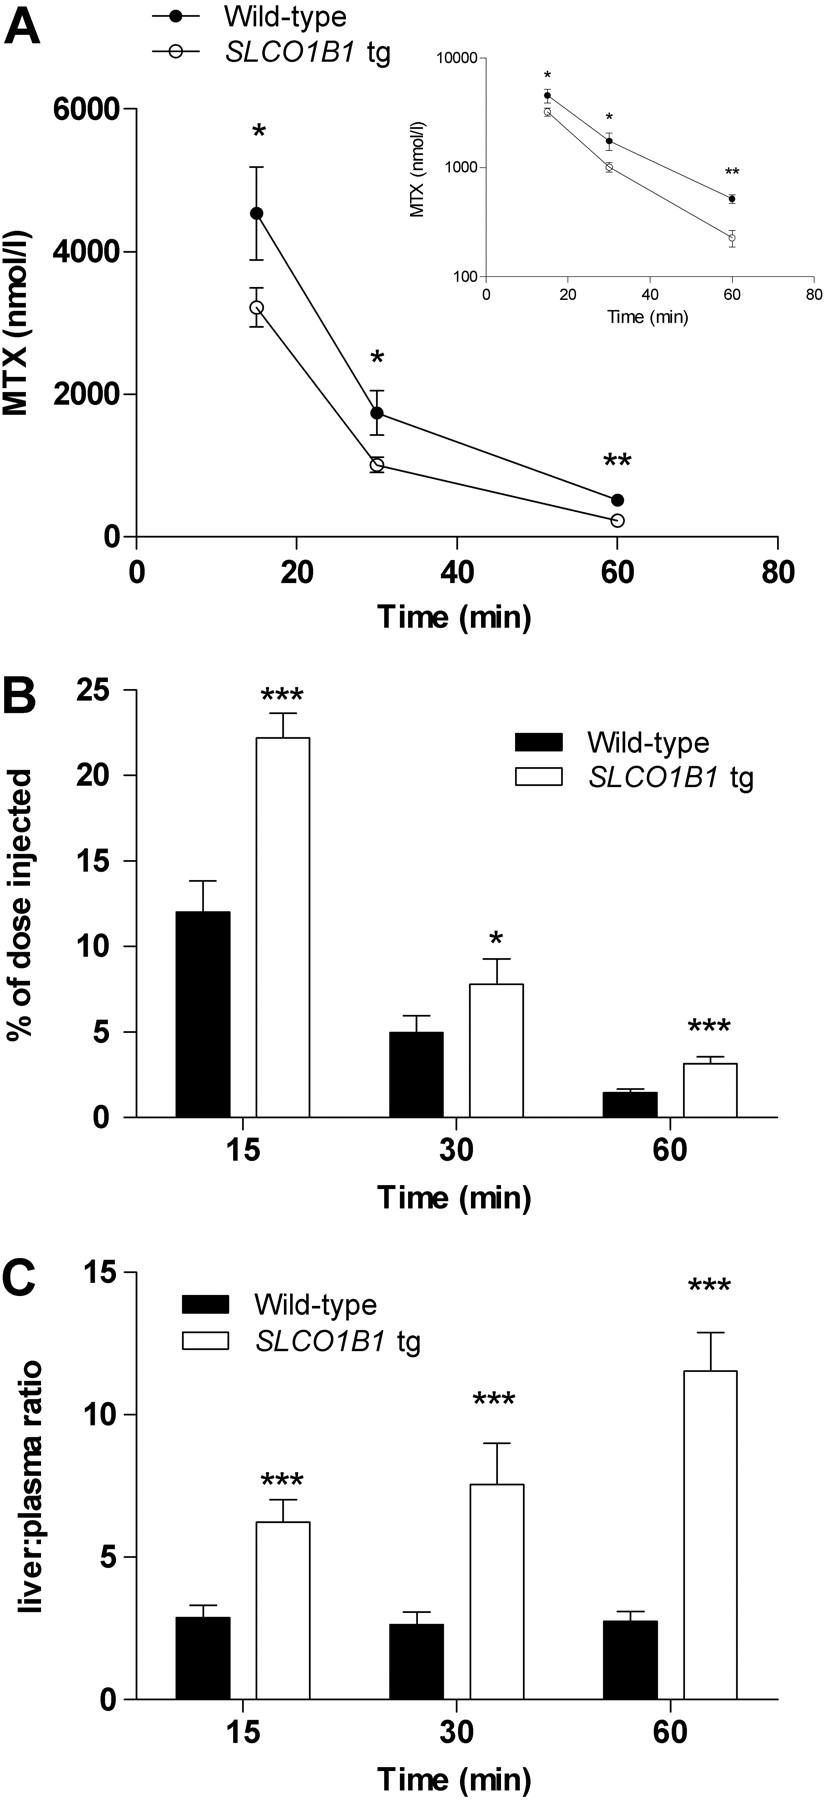 clozaril wbc levels